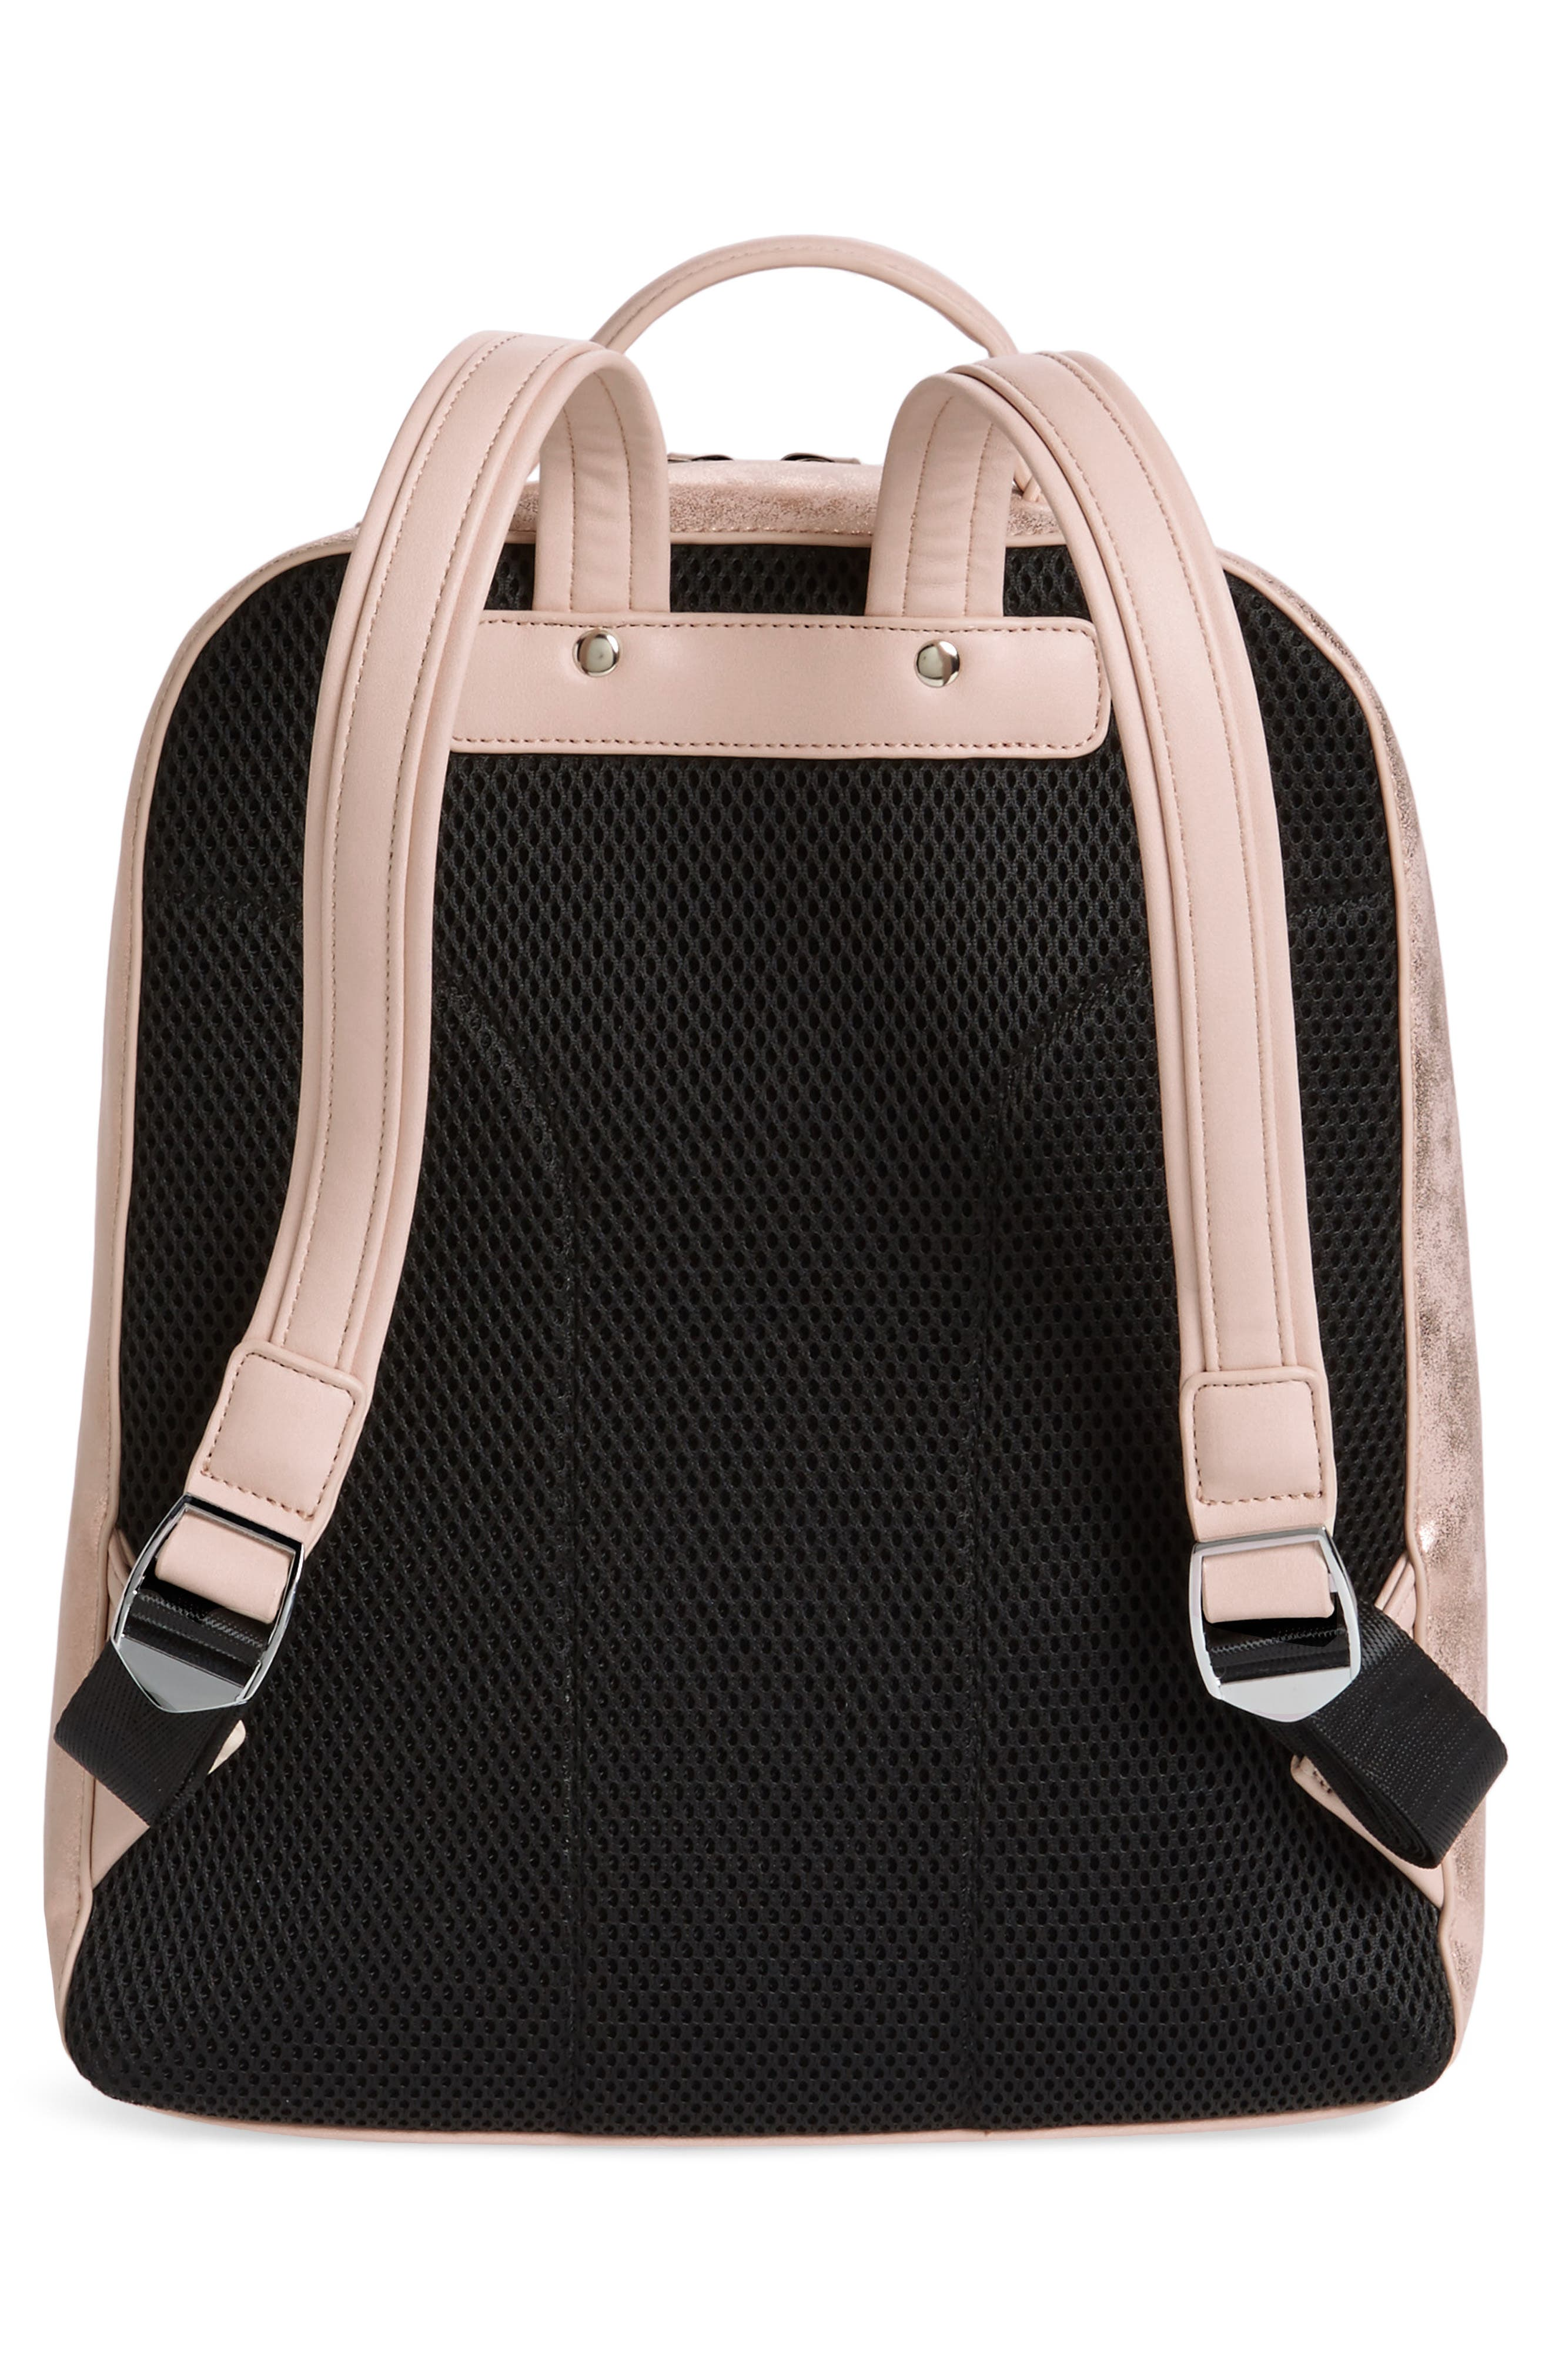 Brooke City Backpack,                             Alternate thumbnail 3, color,                             Blush